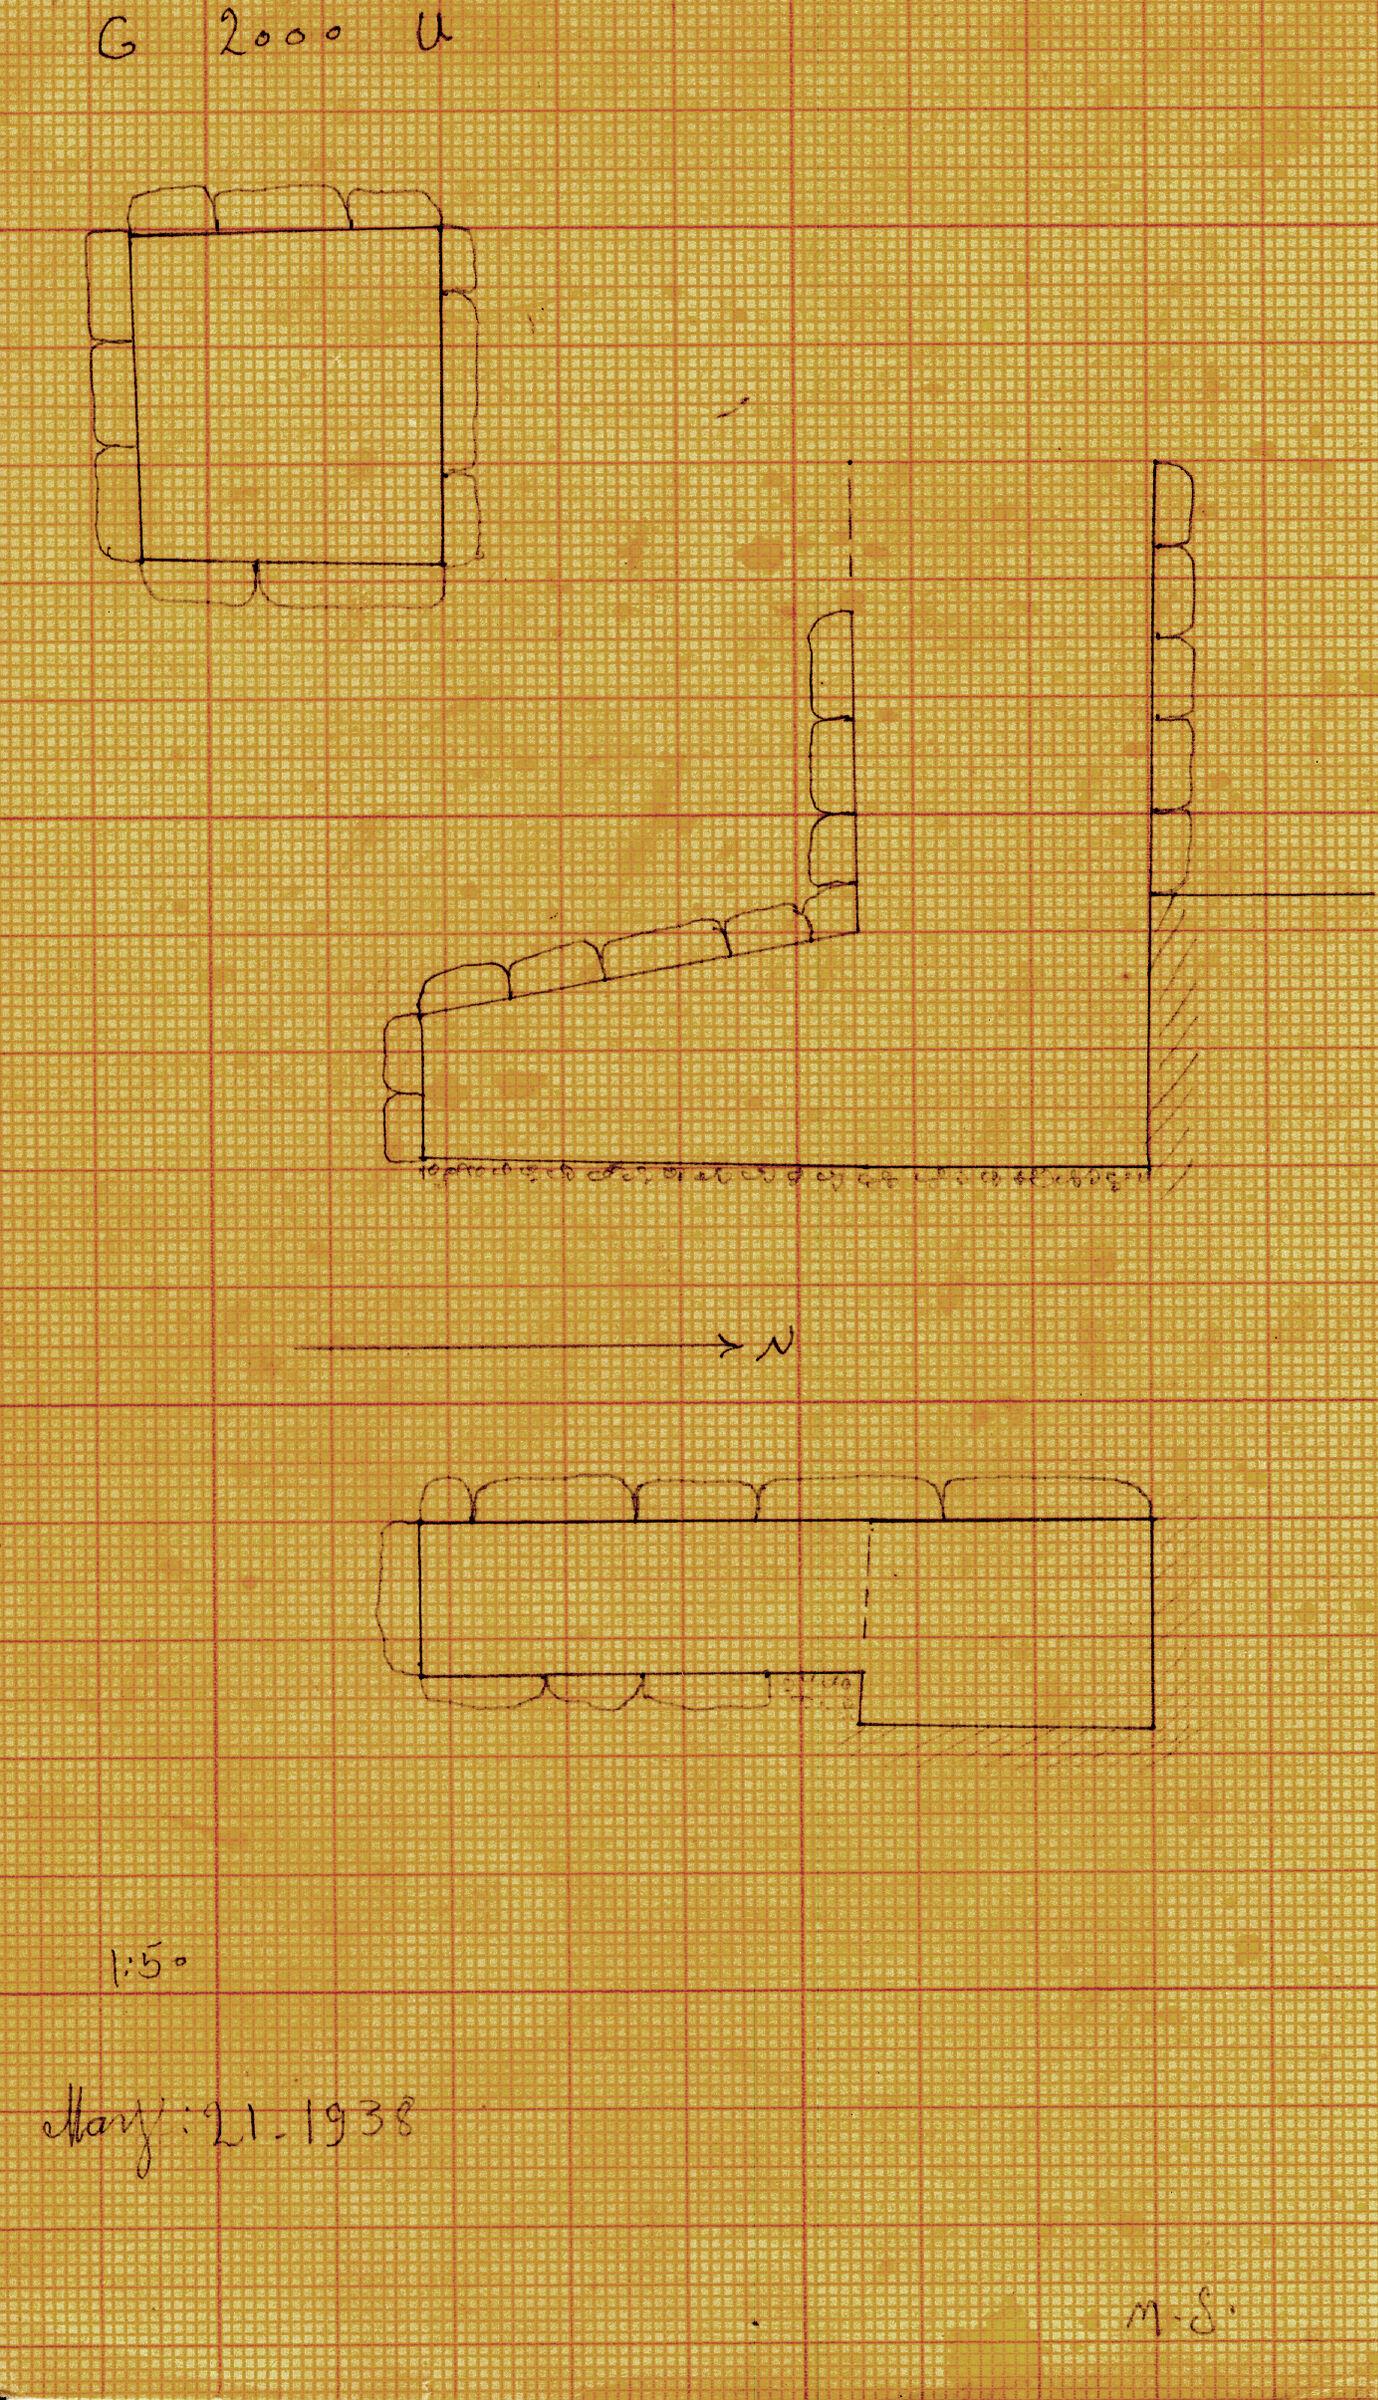 Maps and plans: G 2000, Shaft U